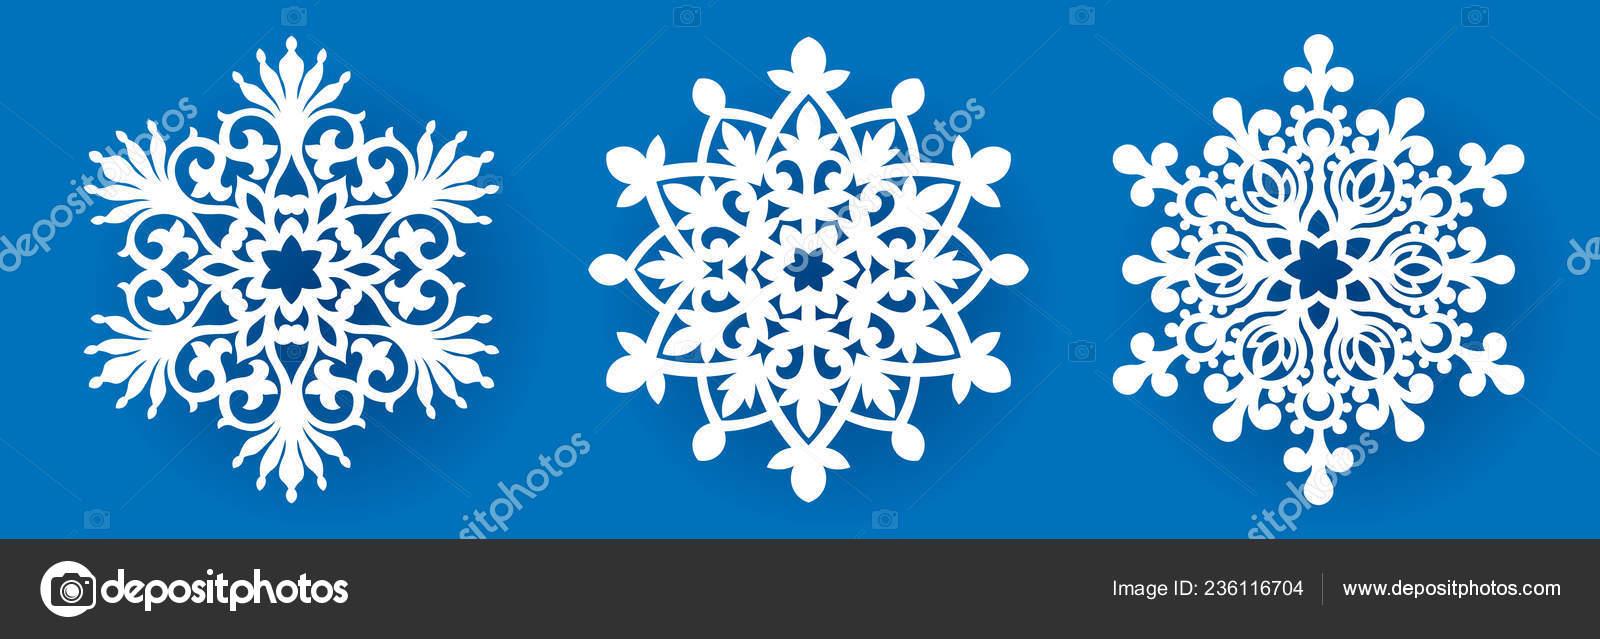 Christmas Cutout Patterns.Snowflakes Patterns Cutouts Vector Snowflake Laser Cut